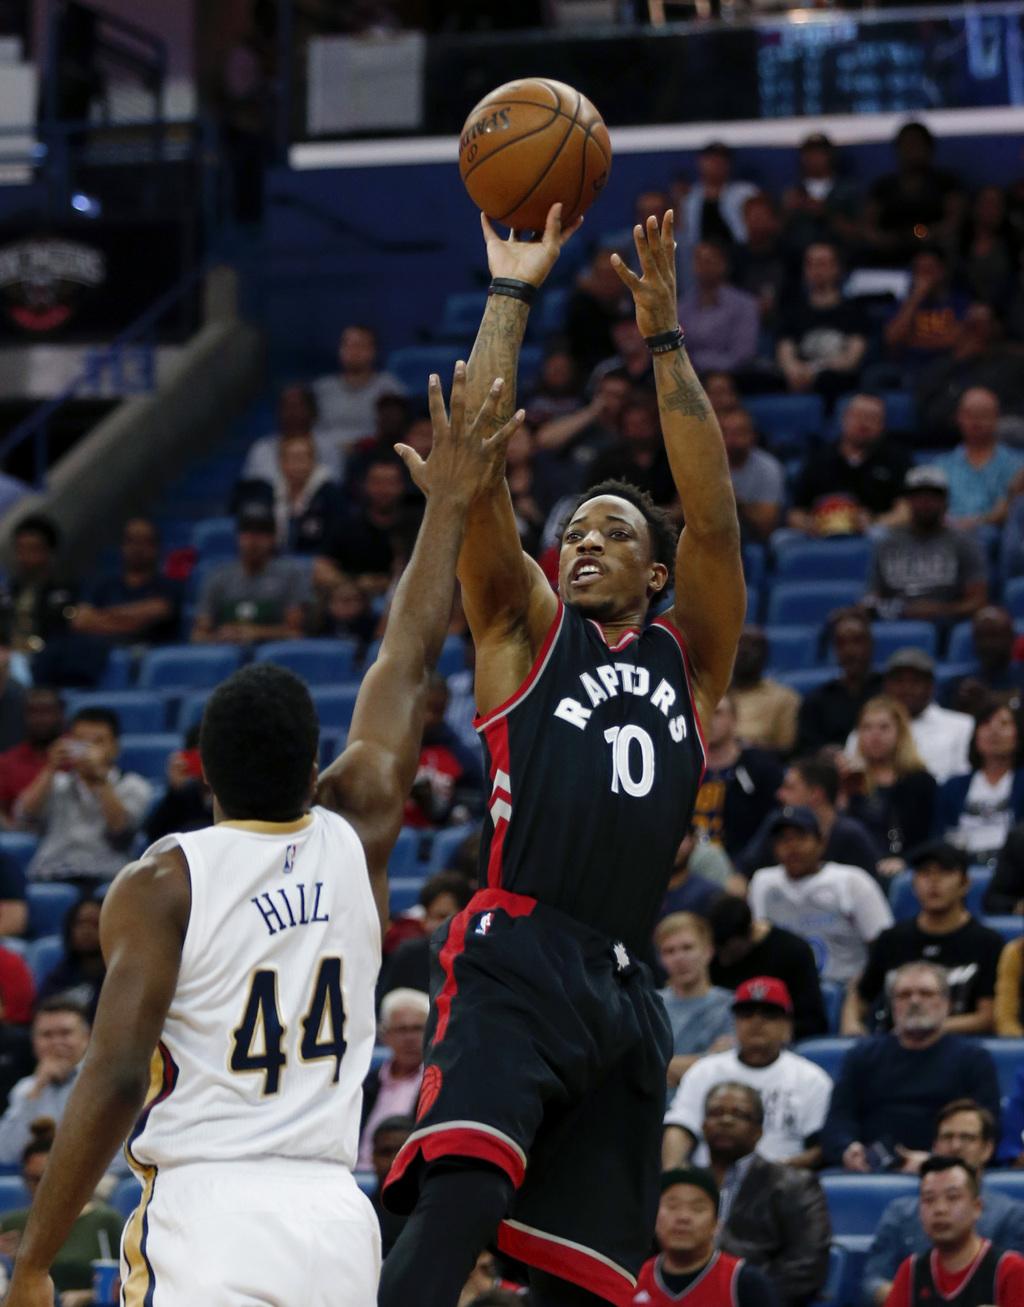 Toronto Raptors guard DeMar DeRozan (10) shoots over New Orleans Pelicans forward Solomon Hill (44) during the first half of an NBA bas...